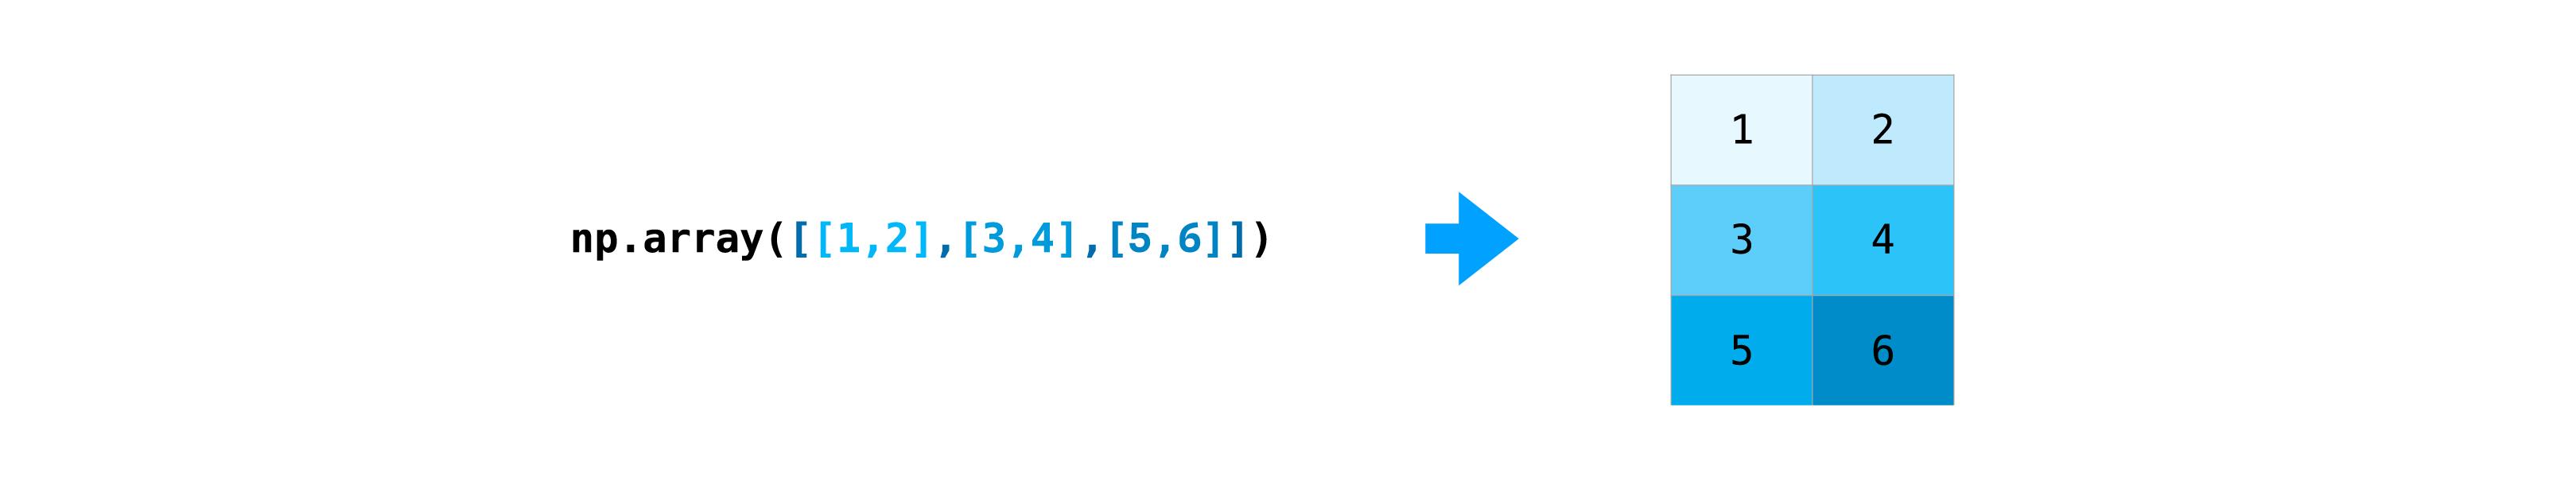 ../_images/np_create_matrix.png